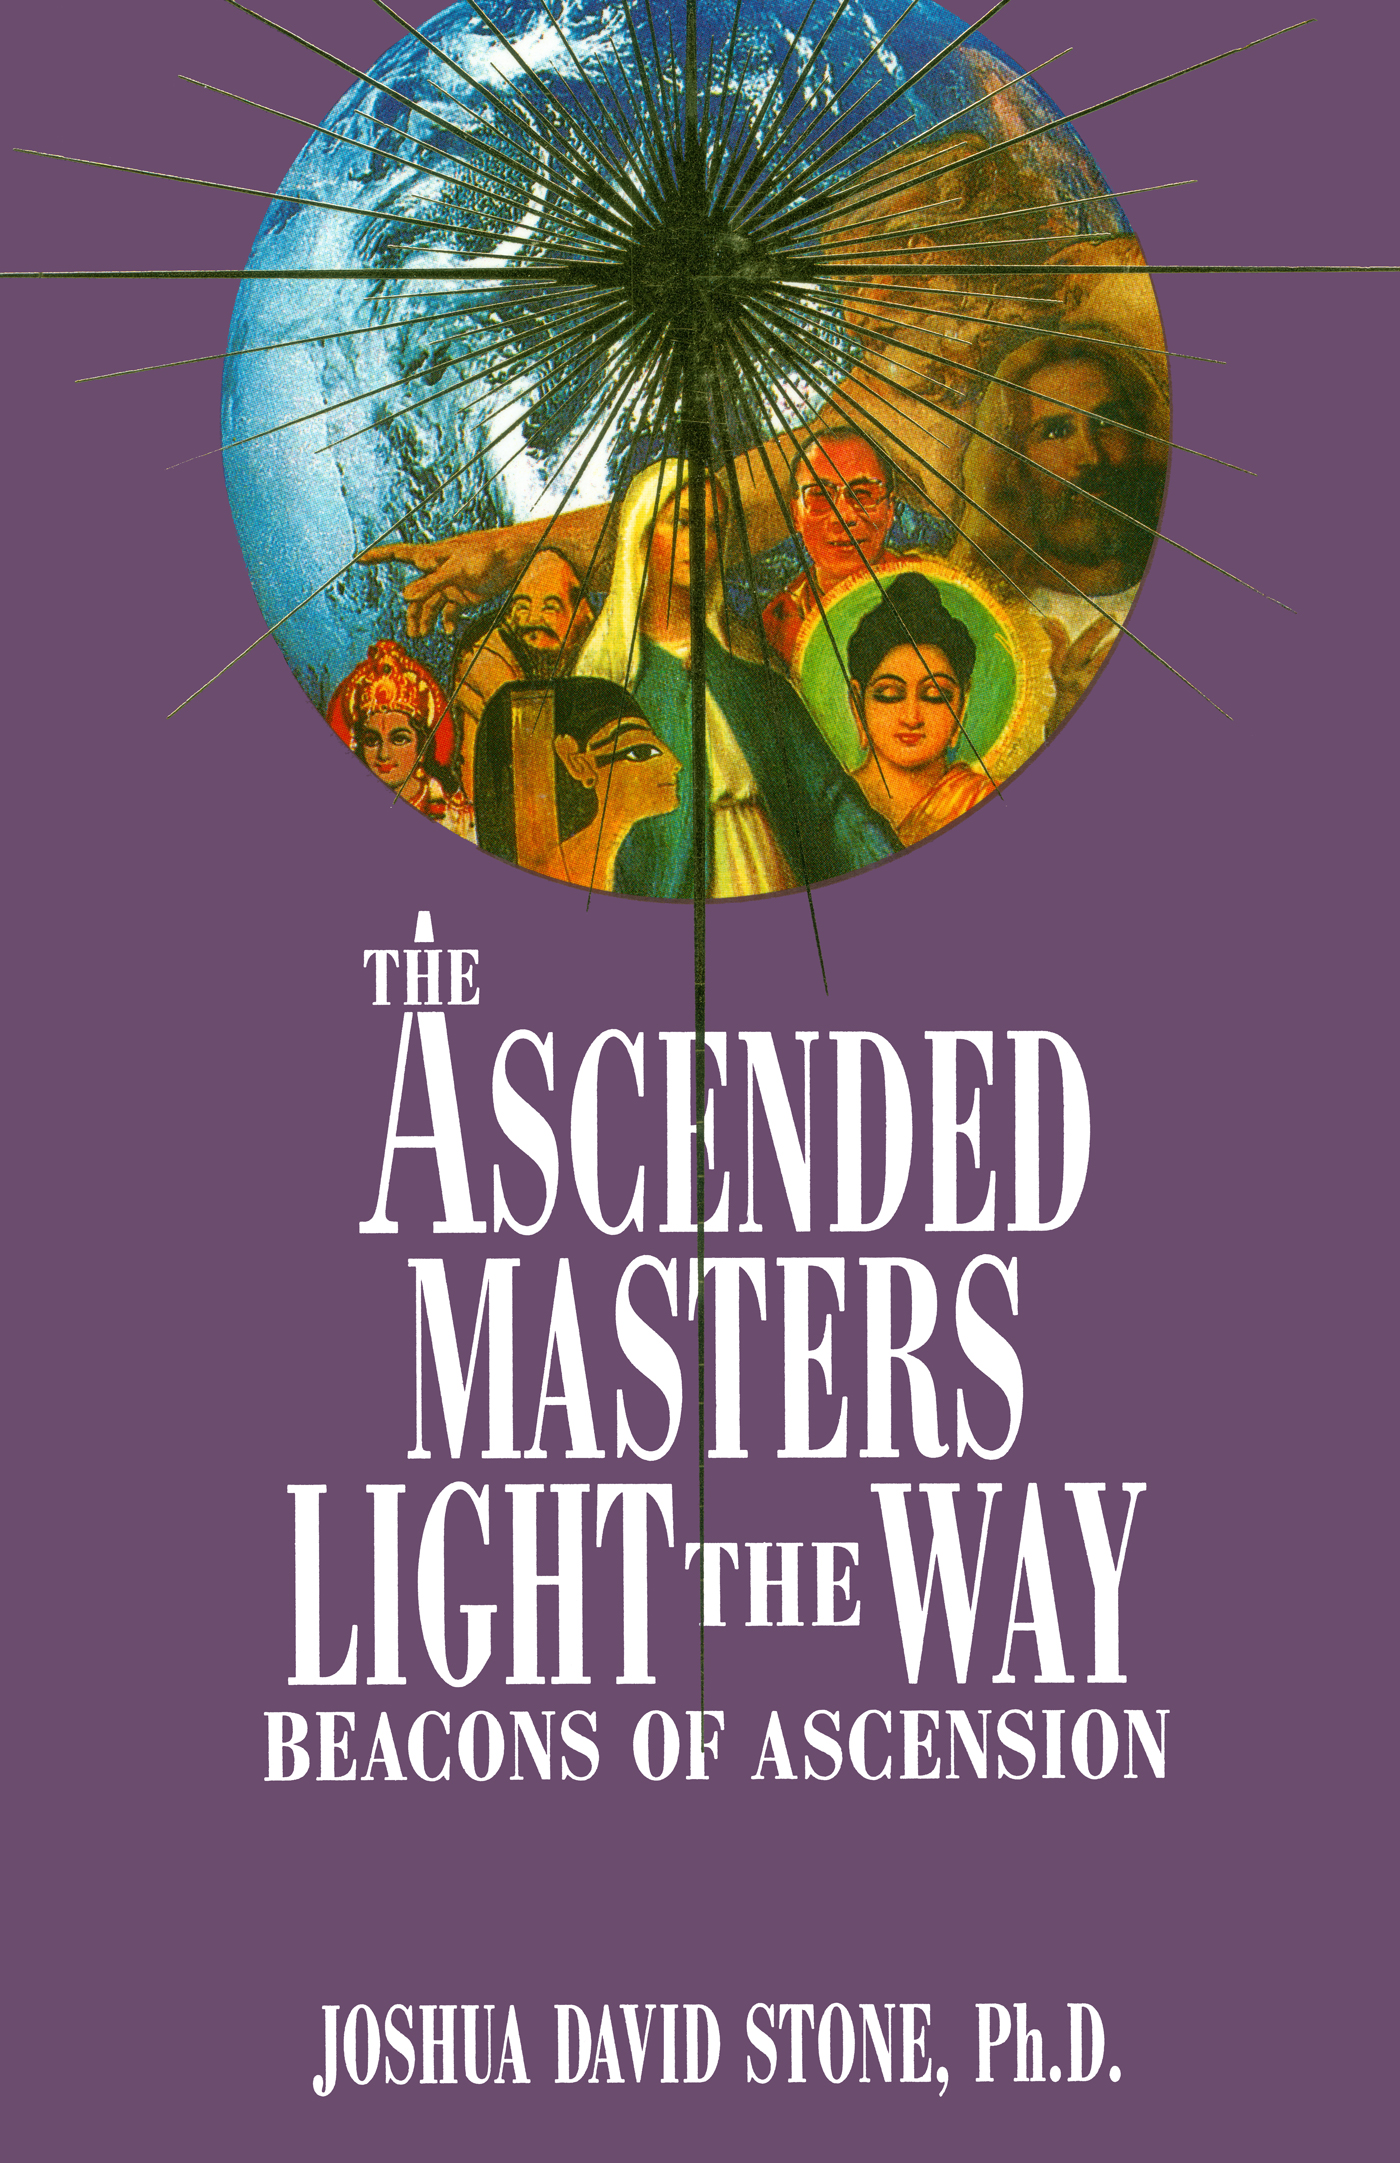 The Encyclopedia of the Spiritual Path (Book 05): The